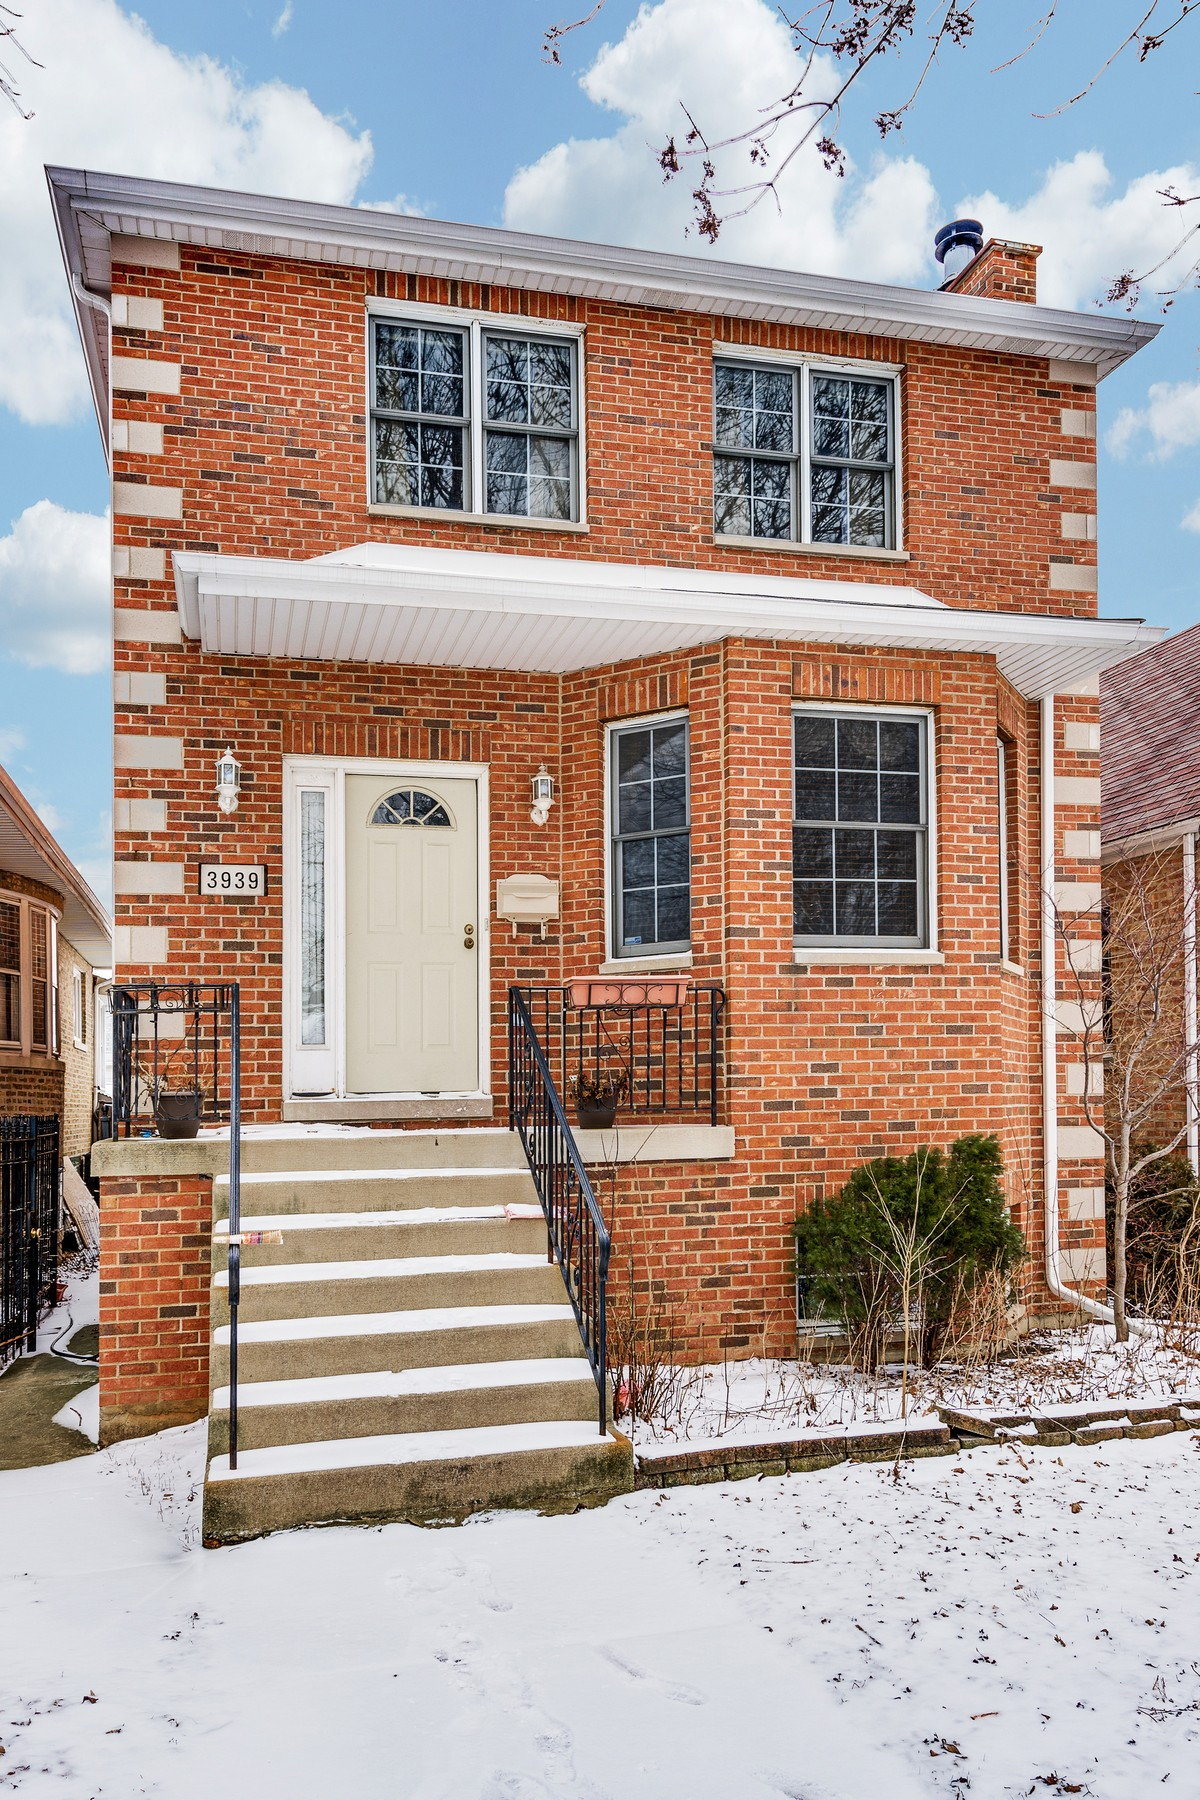 独户住宅 为 销售 在 One of the Best Homes on the Block! 3939 N Ottawa Avenue Dunning, 芝加哥, 伊利诺斯州, 60634 美国